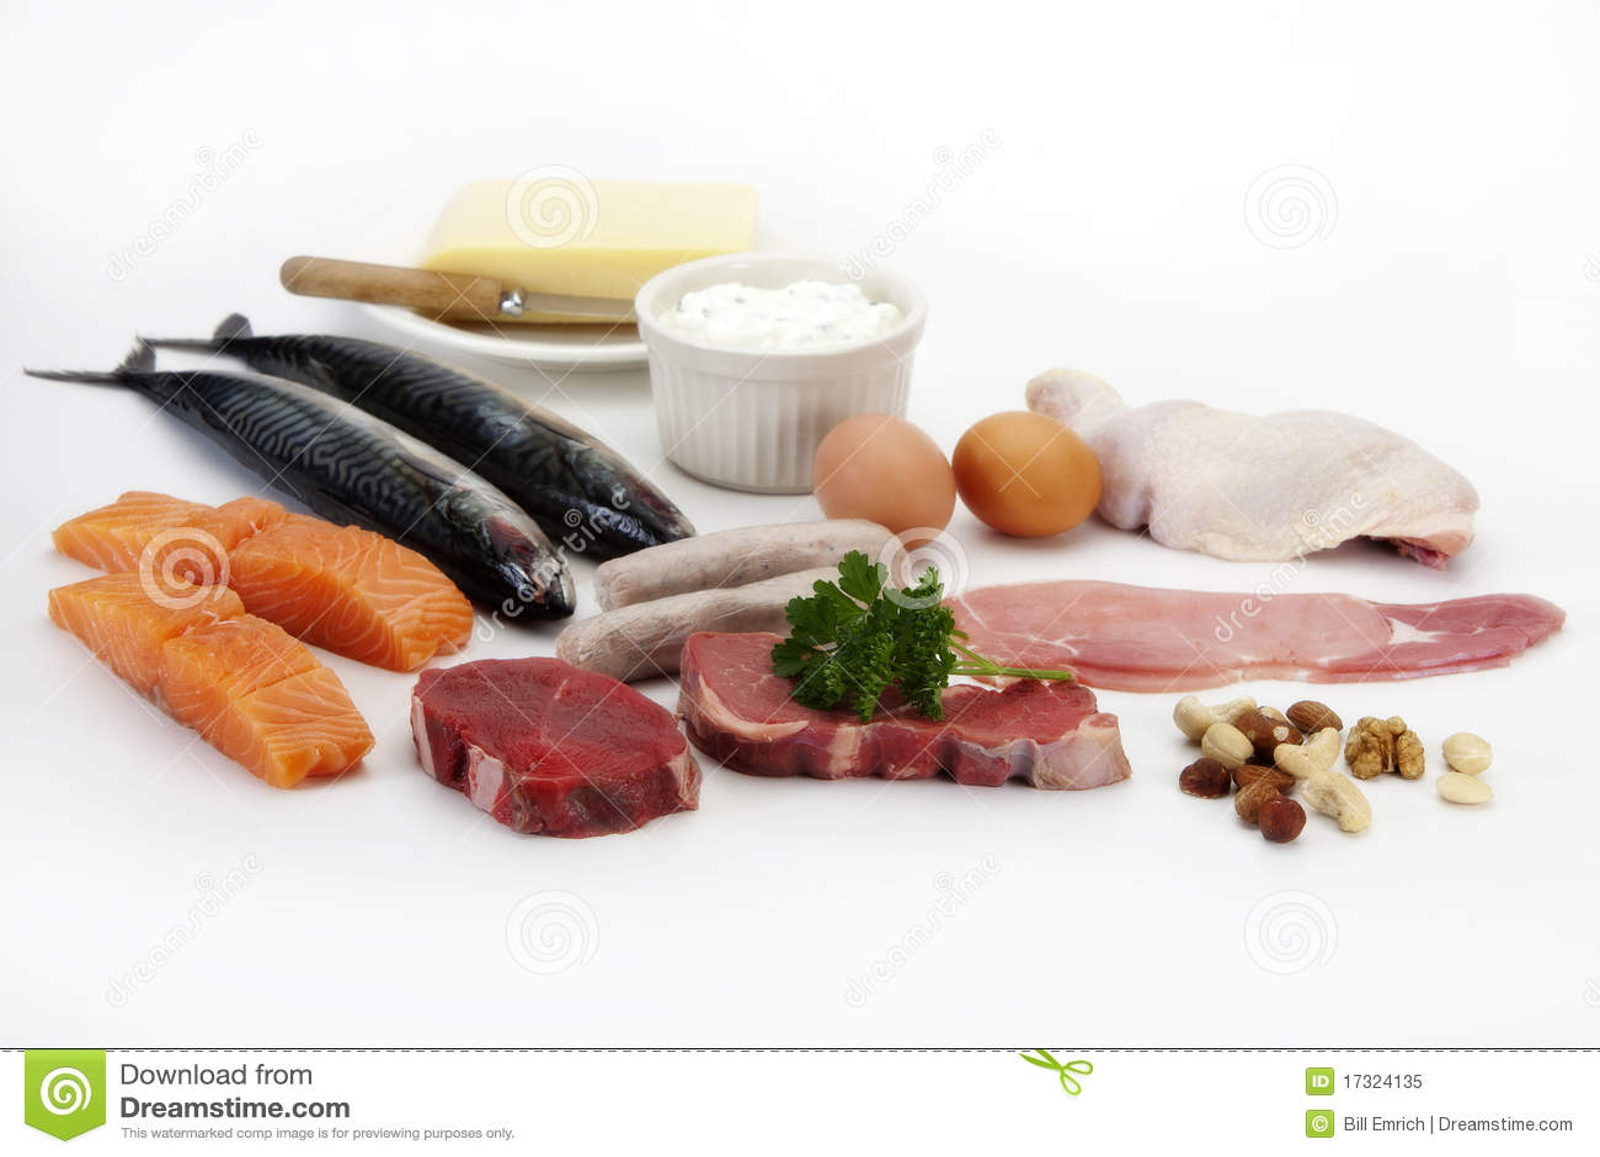 Korean Food Clipart